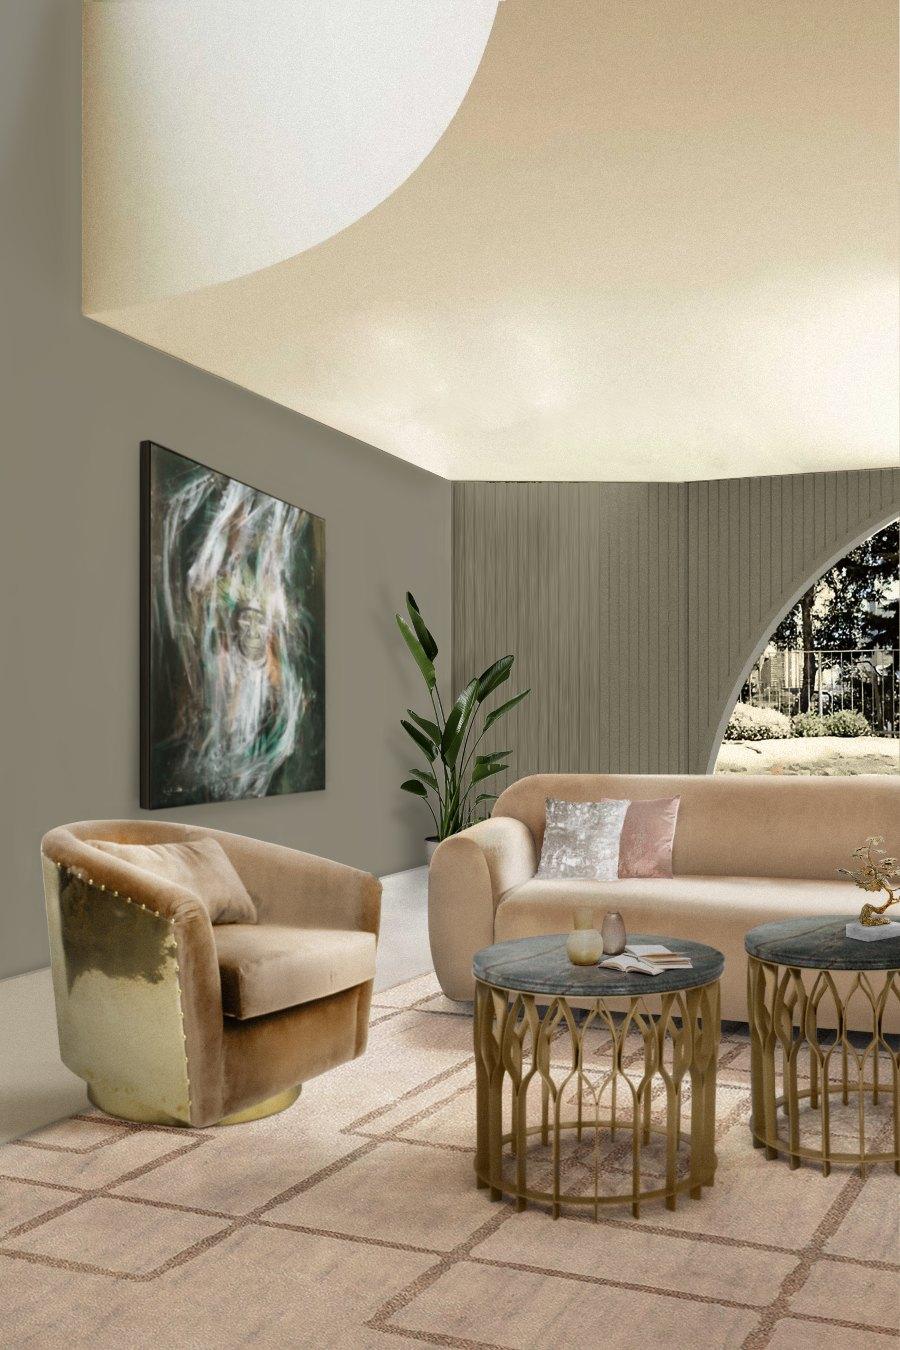 Summer 2020 - Modern Interior Design Trends summer 2020 Summer 2020 – Modern Interior Design Trends Summer 2020 Modern Interior Design Trends 4